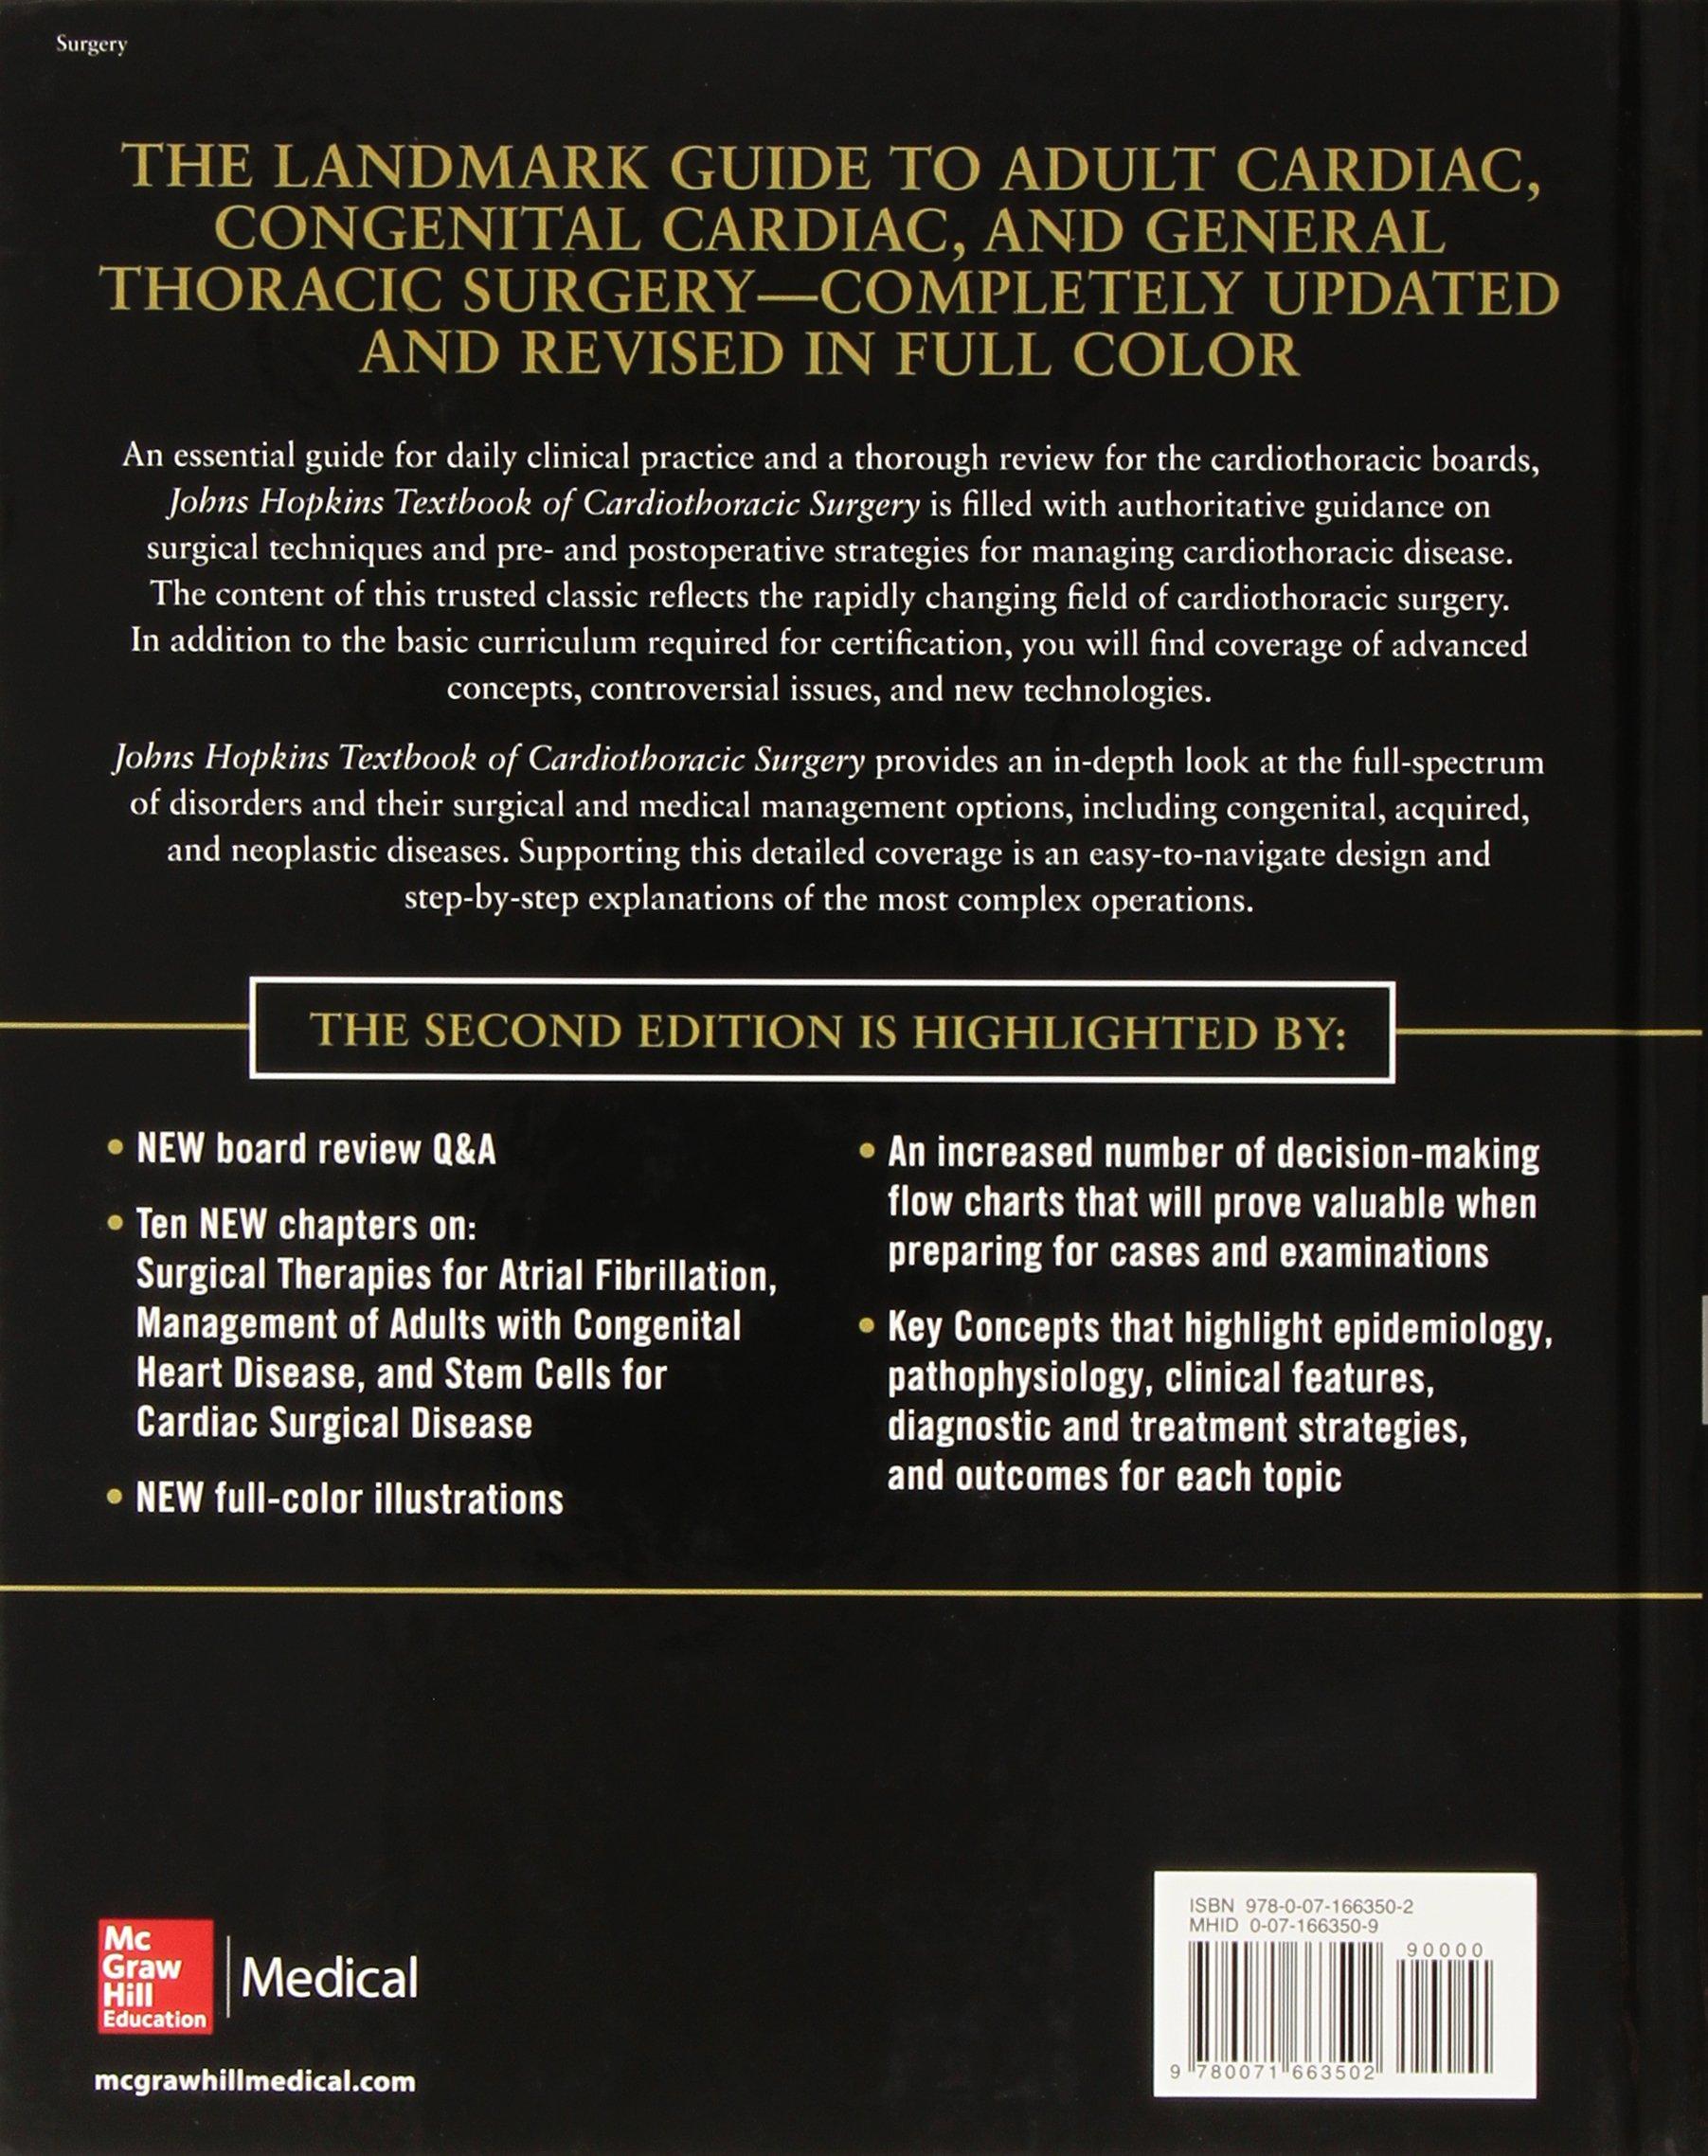 Johns Hopkins Textbook of Cardiothoracic Surgery, Second Edition:  Amazon.co.uk: David Yuh, Luca Vricella, Stephen Yang, John Doty: Books